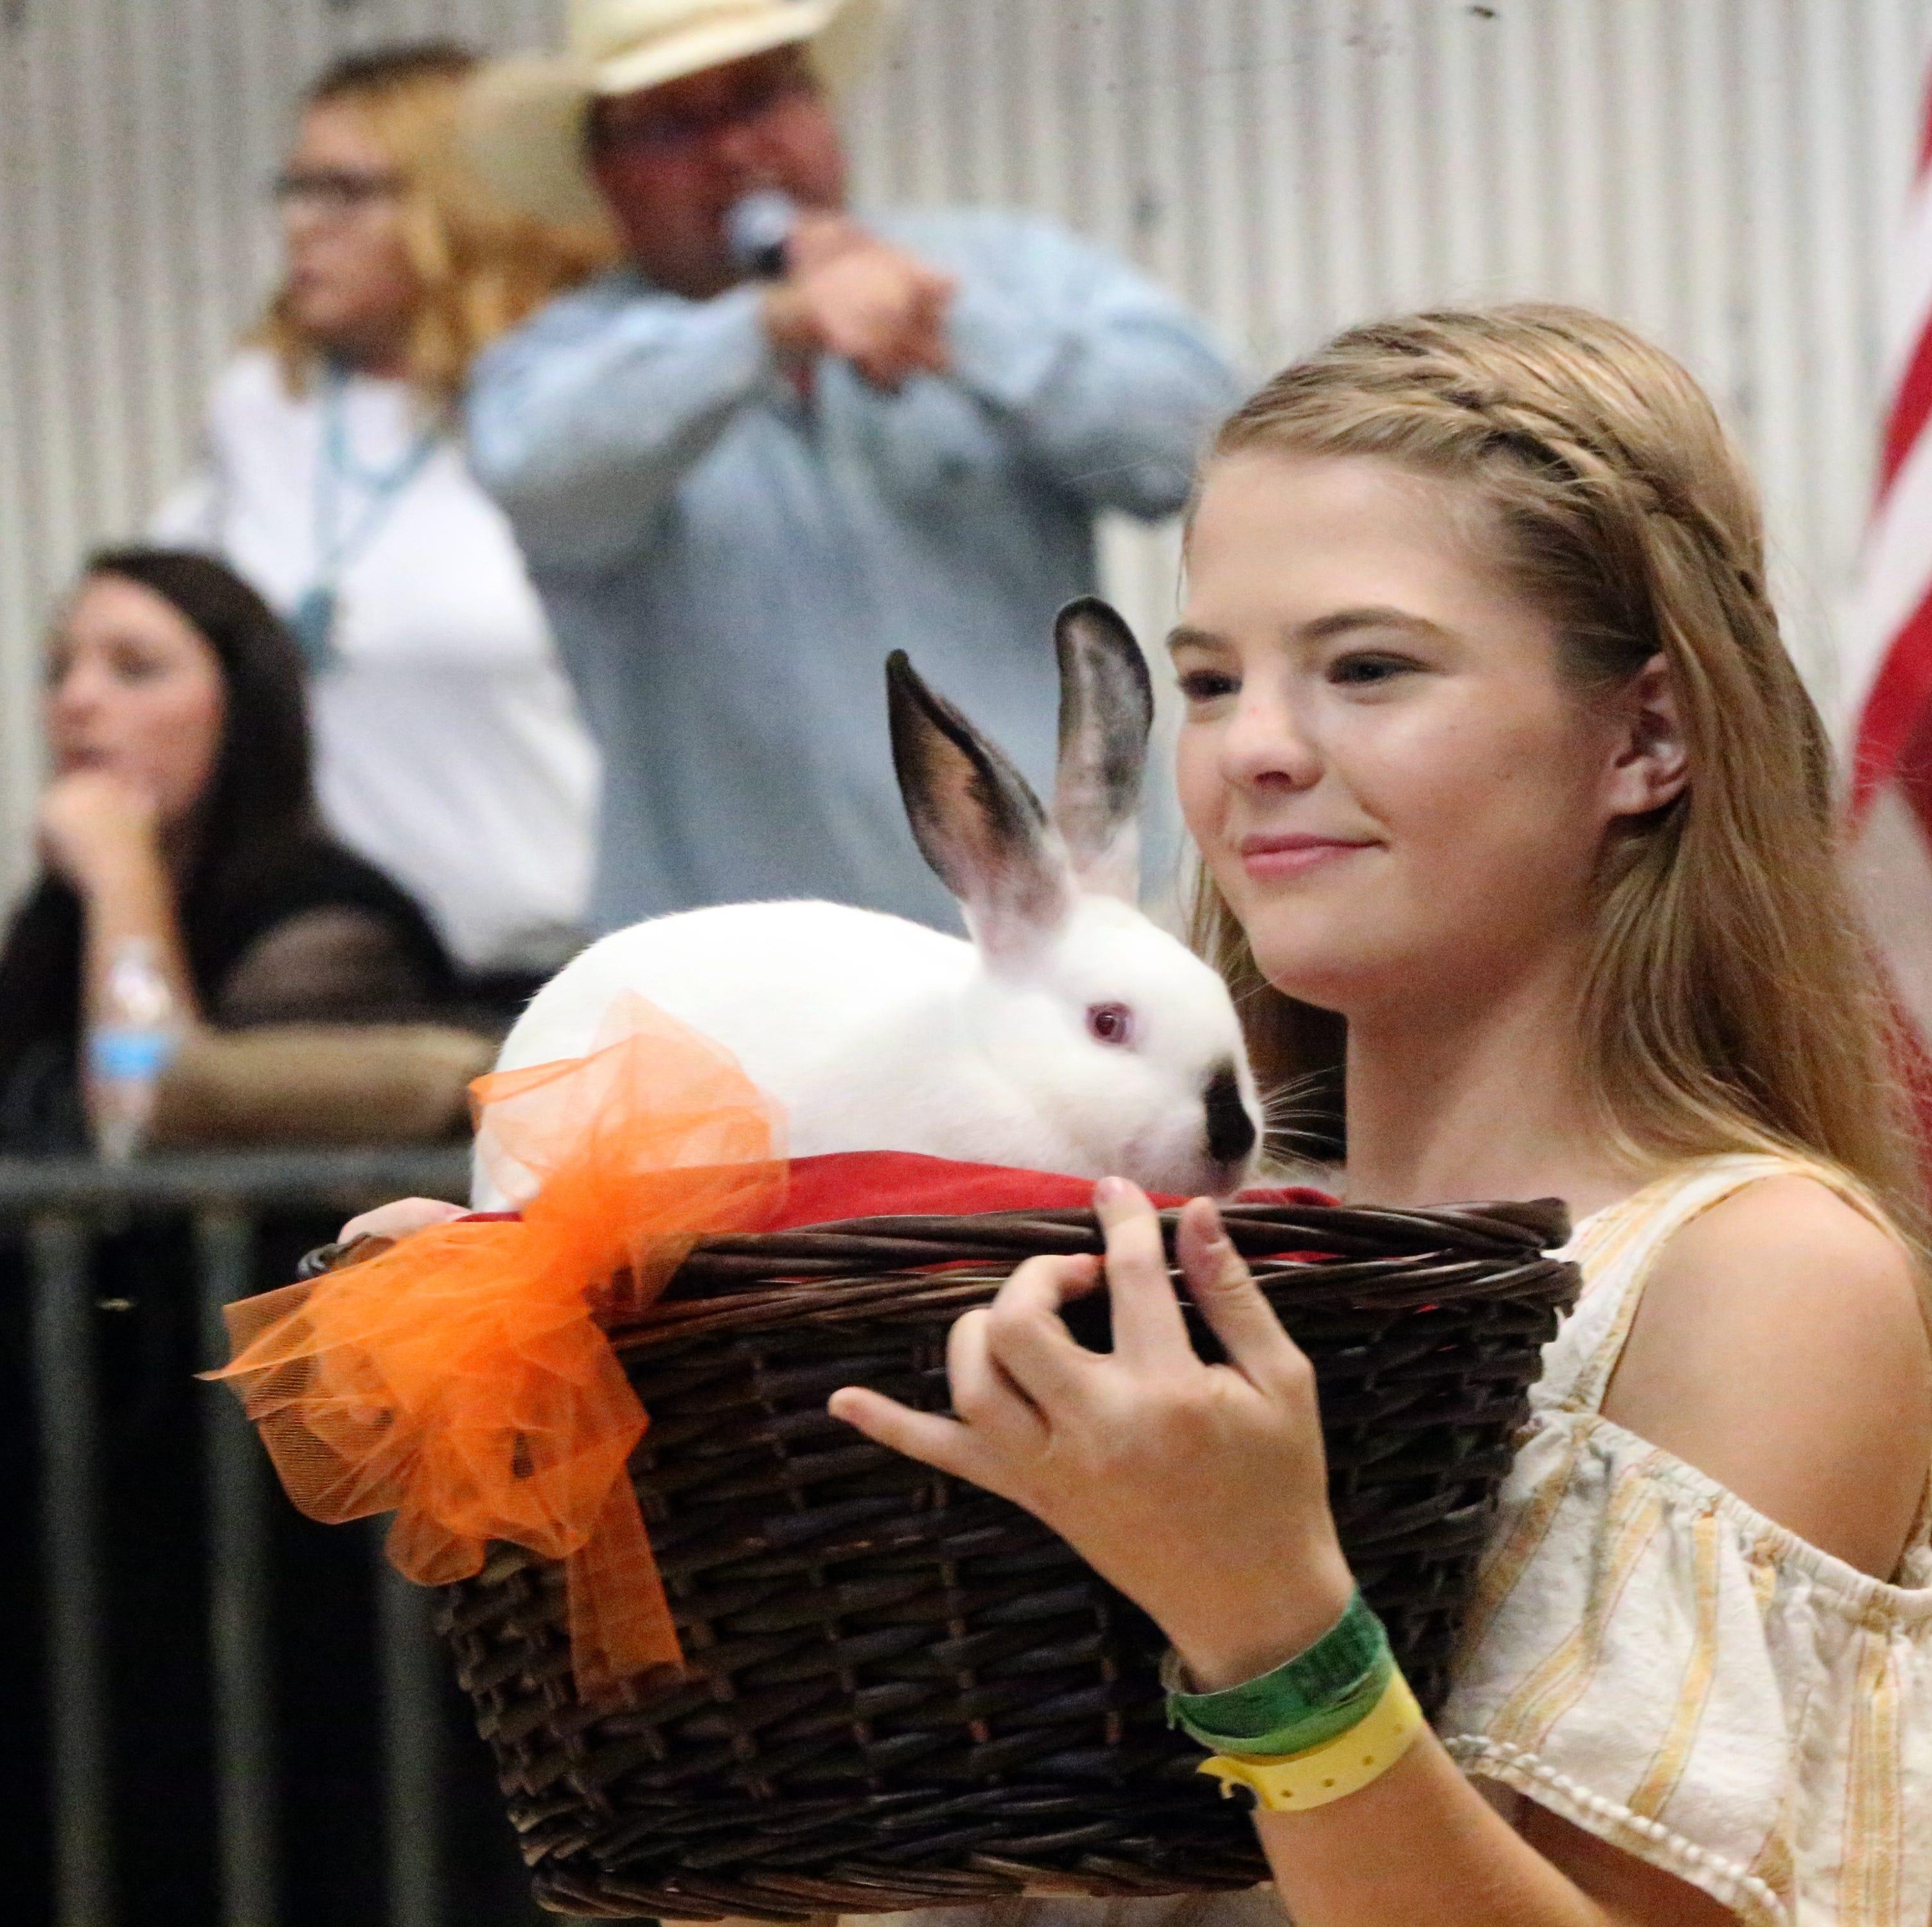 Scenes from the El Paso County Fair & Junior Livestock Show auction Saturday